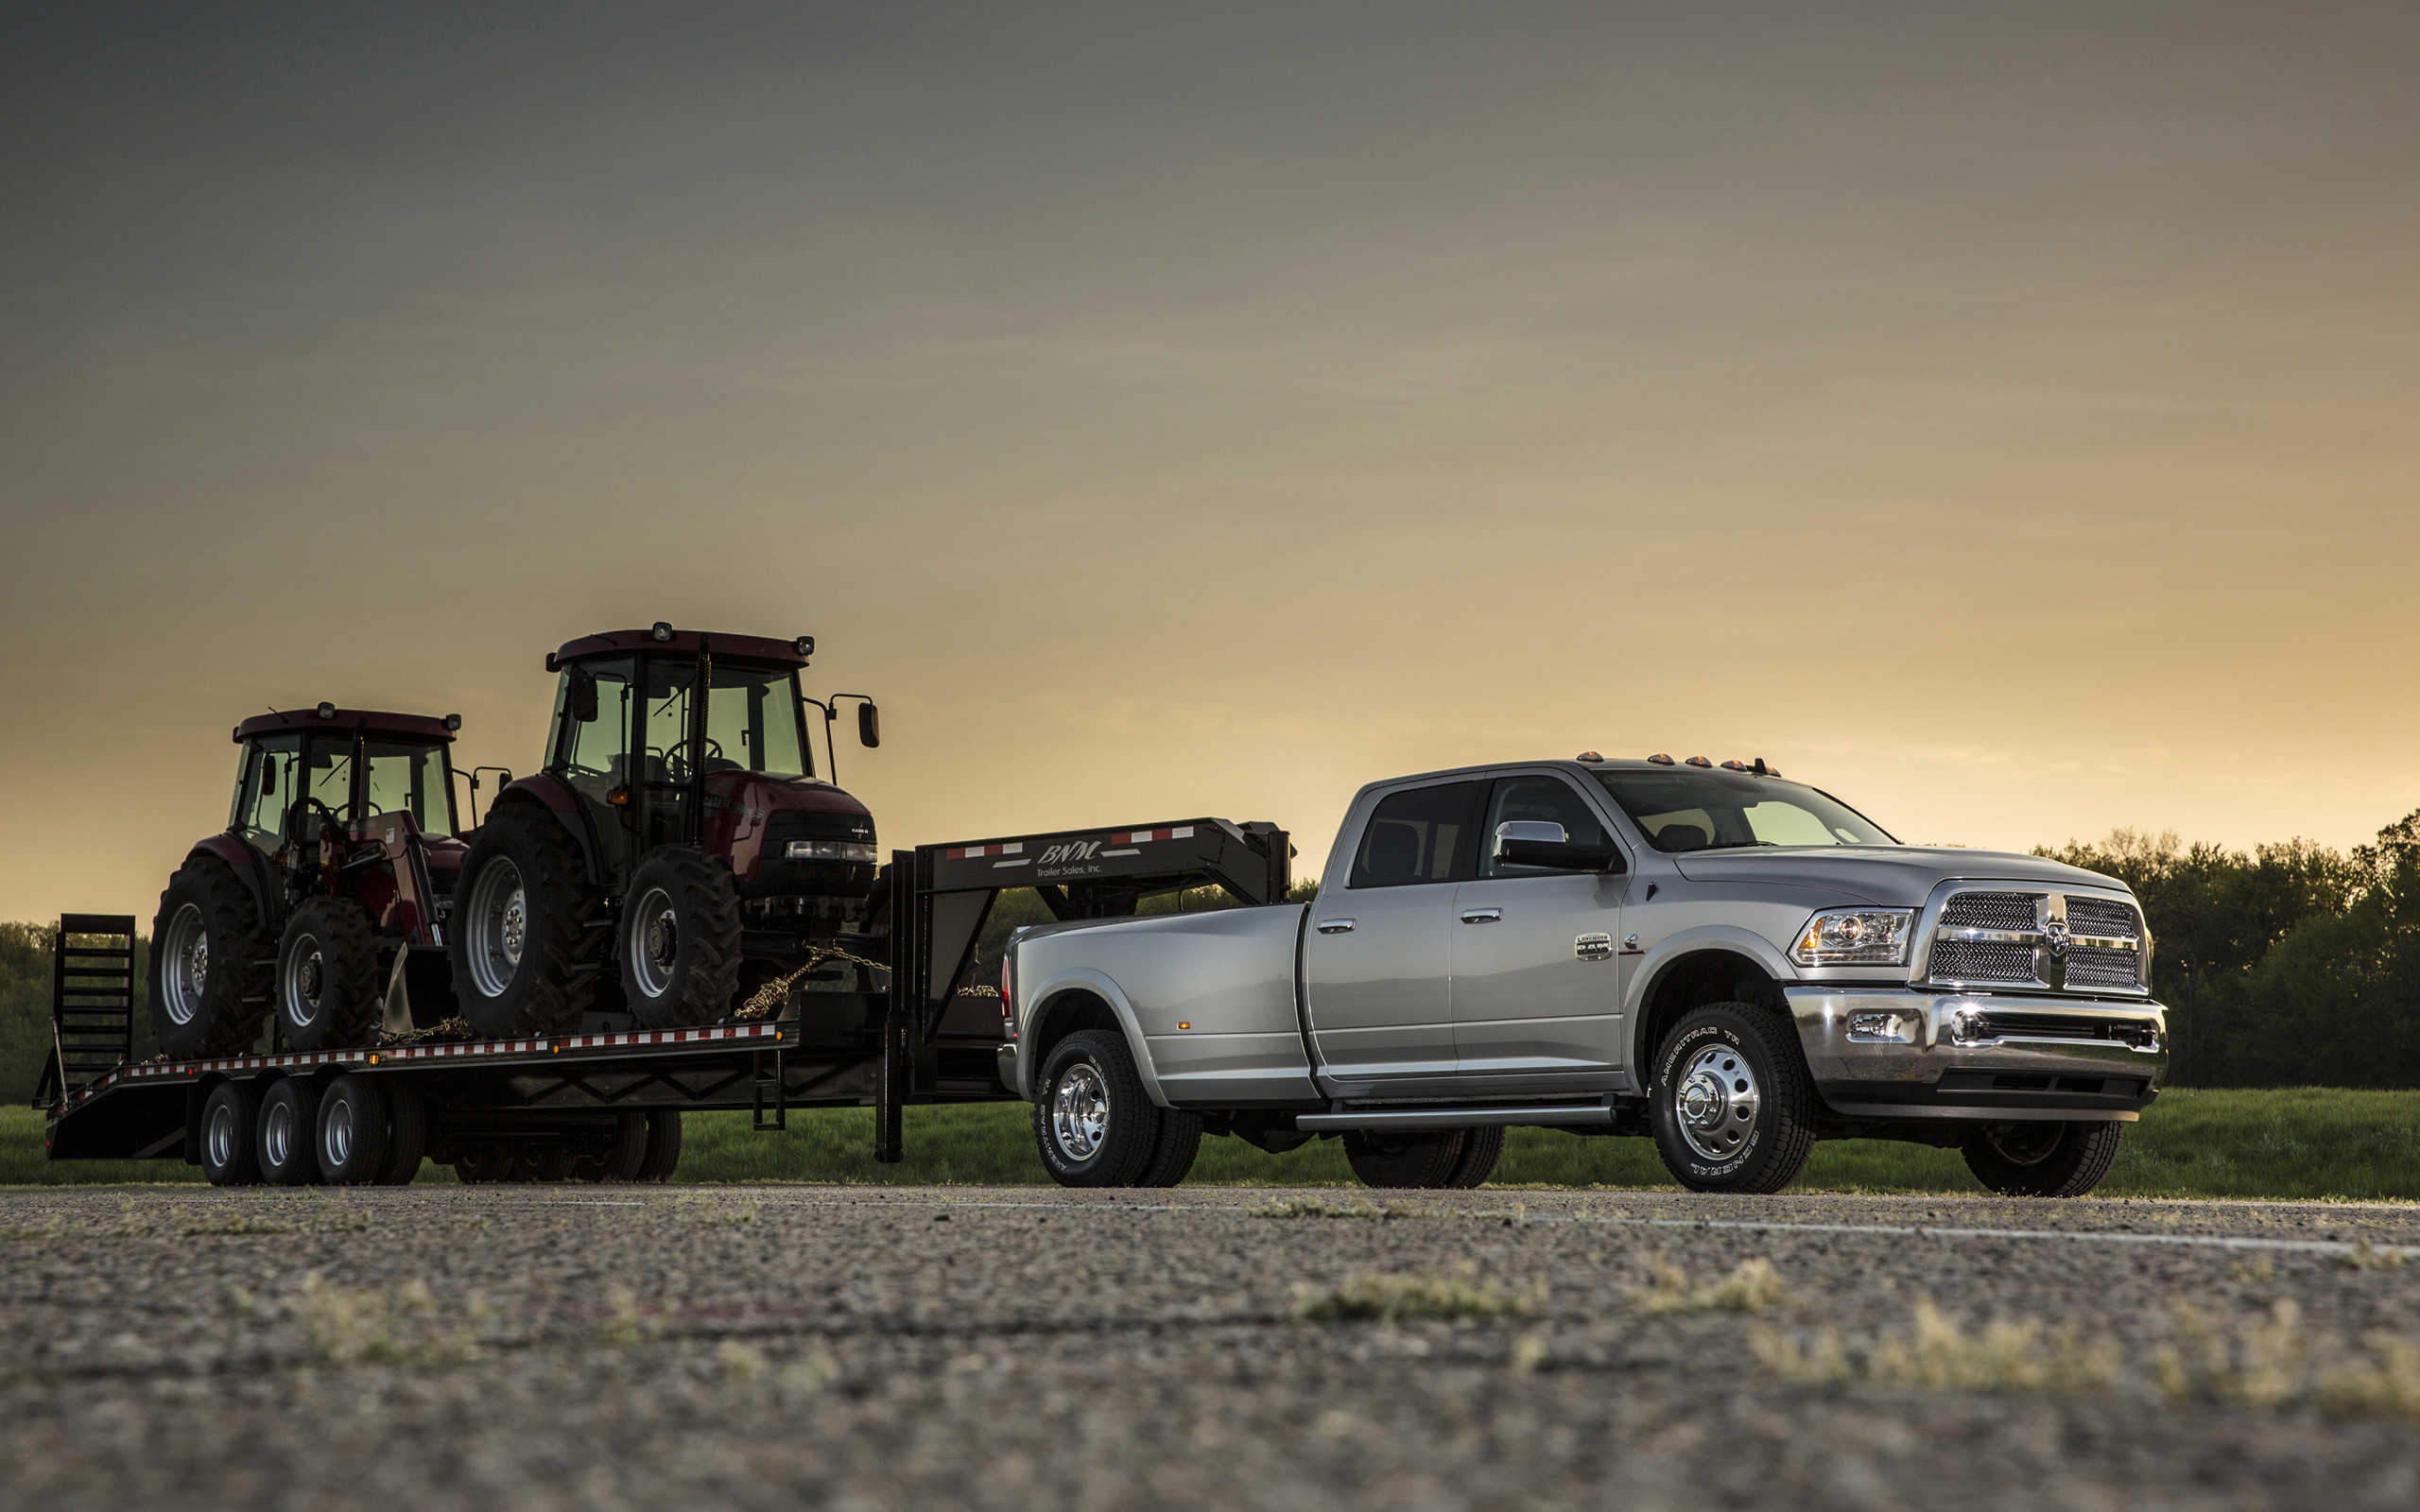 2013 Dodge Ram 3500 4×4 truck r wallpaper | | 112296 .